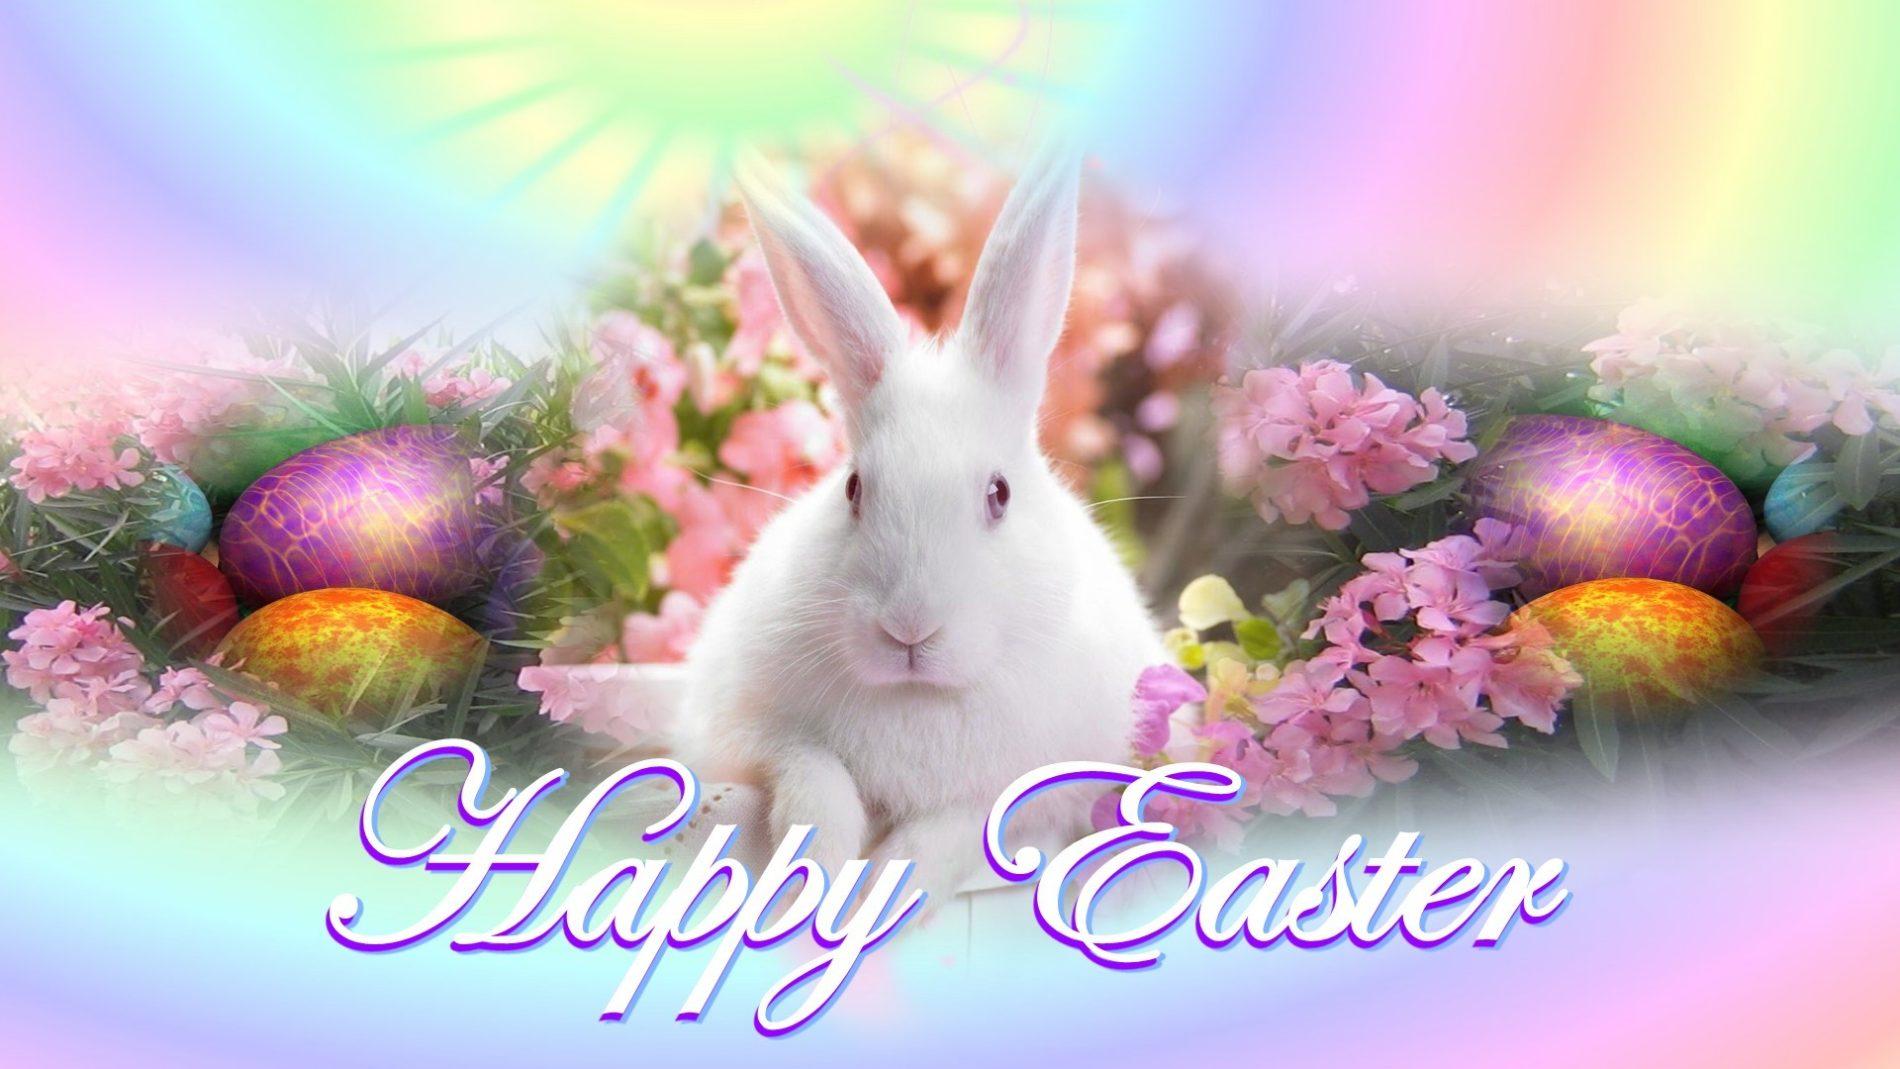 Happy Easter Sunday Wallpaper HD for Desktop 2018 1900x1069